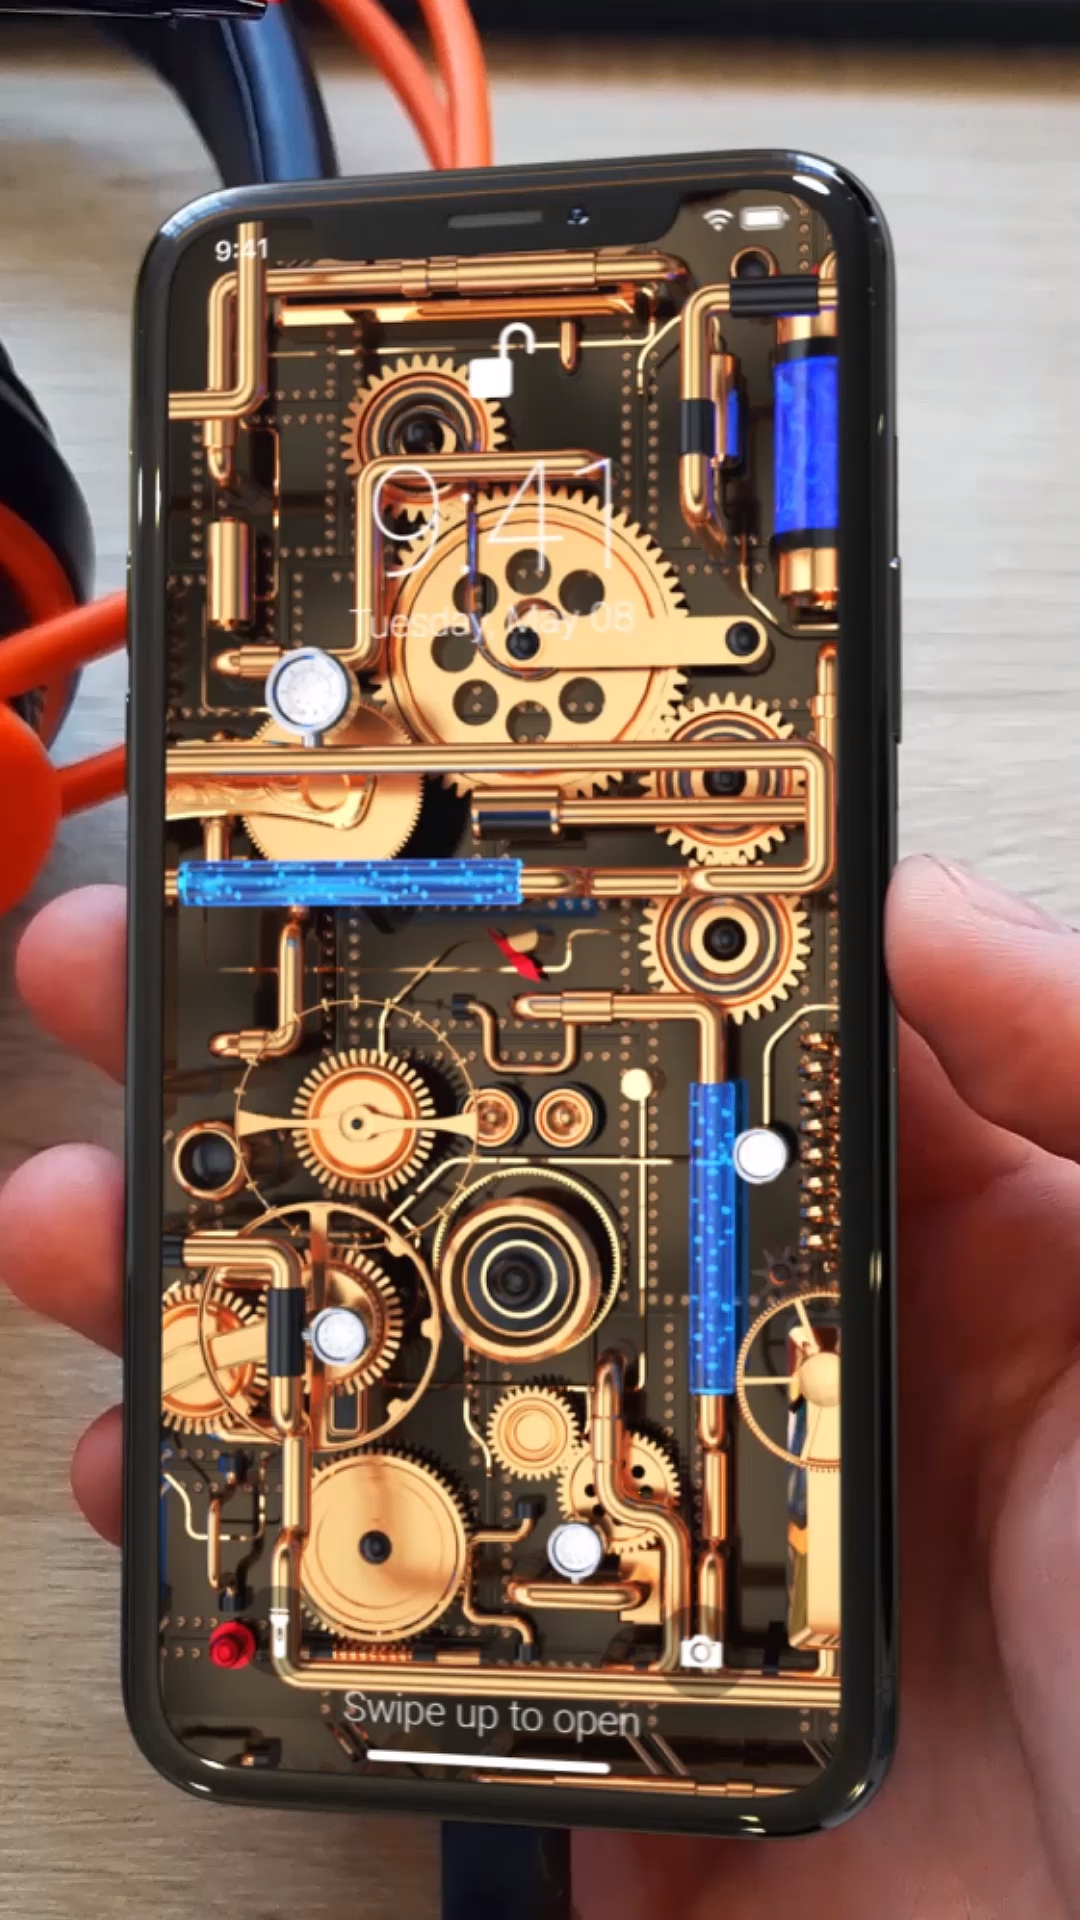 Steam Punk Live Wallpaper For Iphone 2020 Elma Duvar Kagidi Telefon Duvar Kagitlari Eglenceli Gercekler